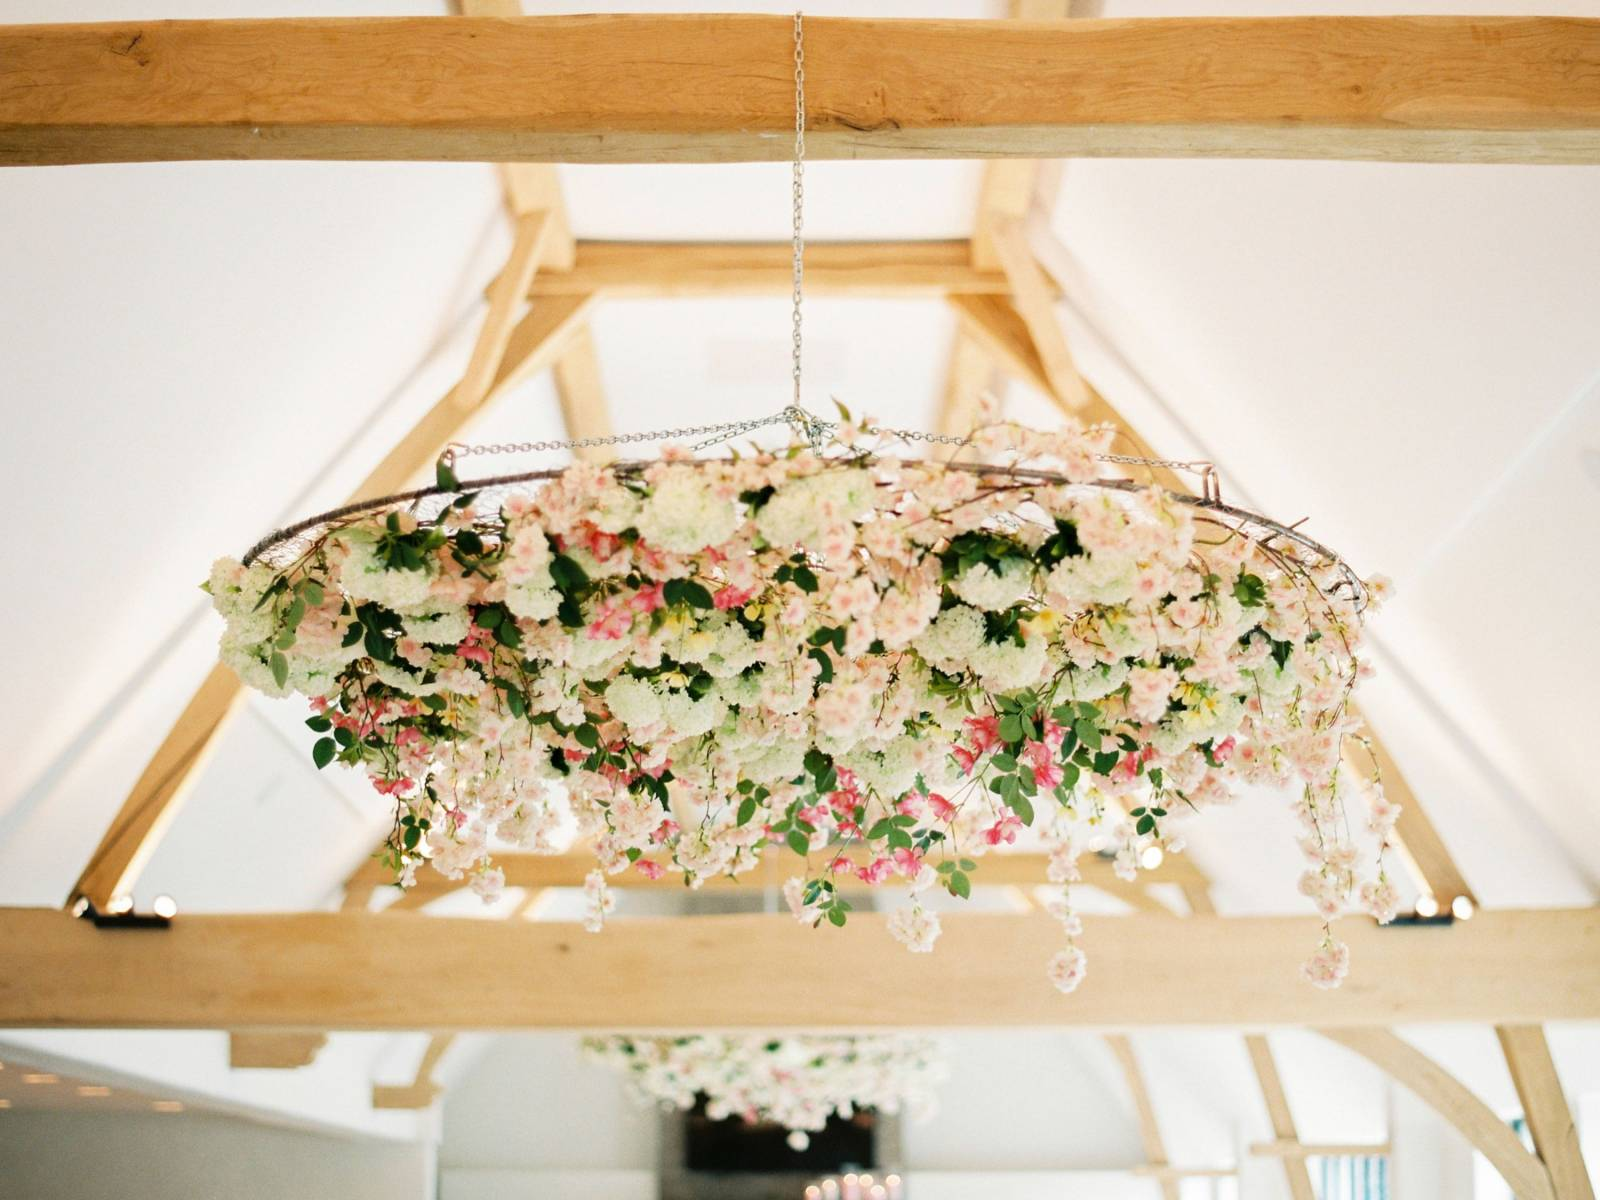 Maison Julie - Bruidsboeket - Bloemen huwelijk trouw bruiloft - Kelly & Jonas - Long Story Short - House of Weddings - 15